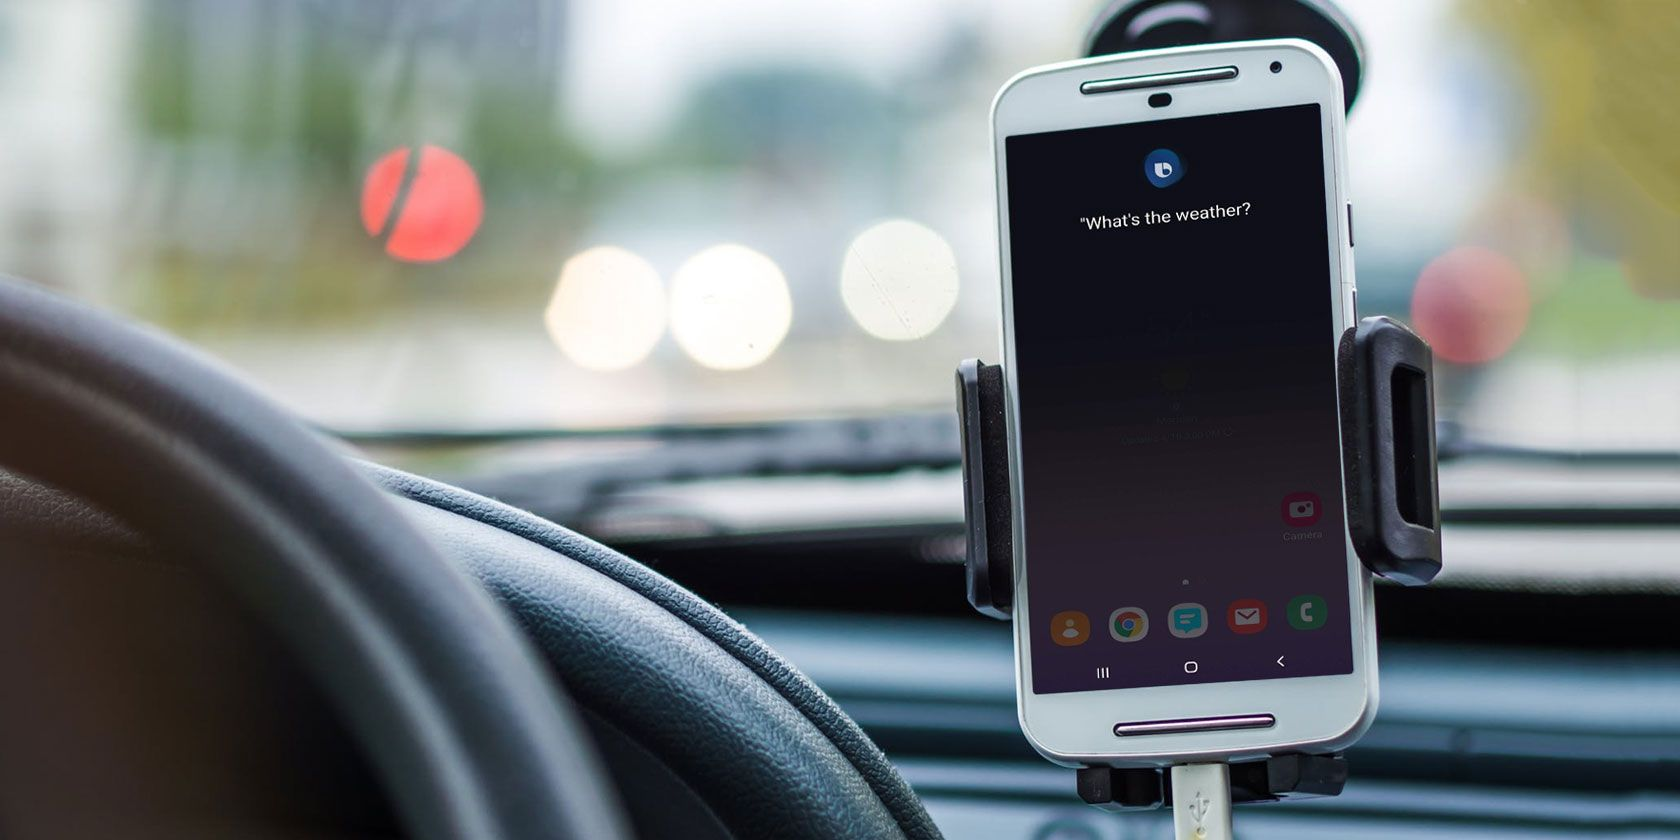 4 Ways to Use Bixby on Your Samsung Phone | MakeUseOf